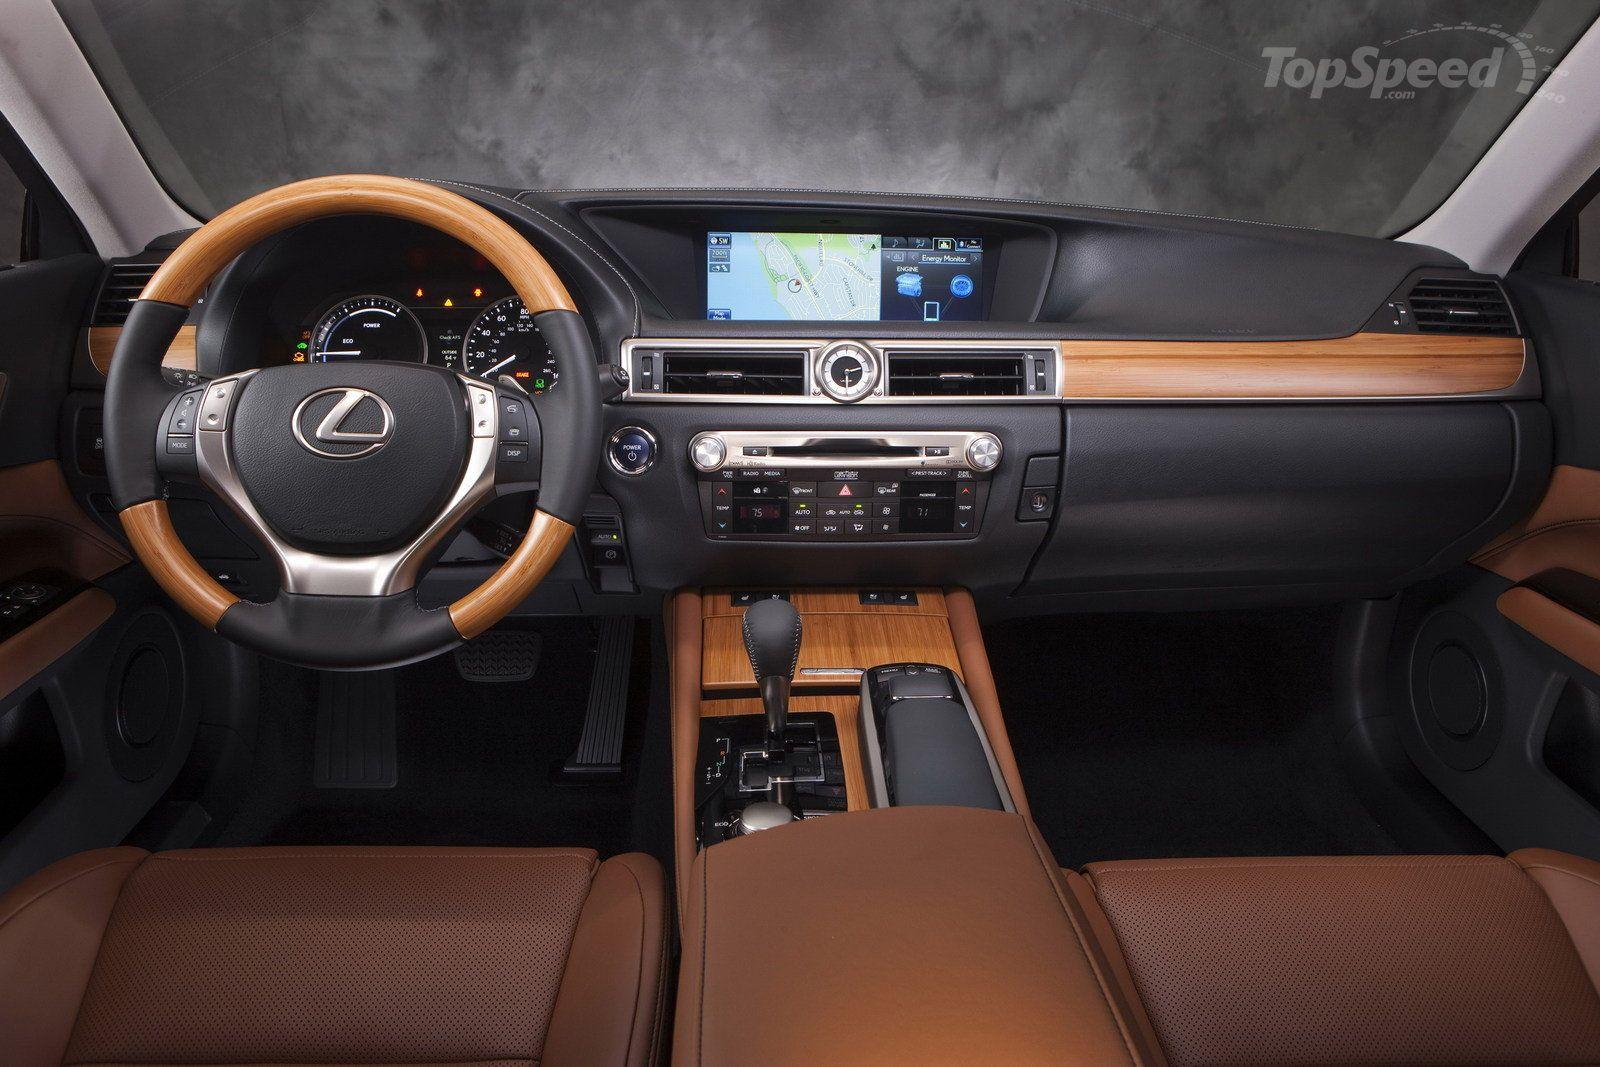 2015 Lexus Gs 450h F Sport Top Speed Lexus Best New Cars Lexus 350